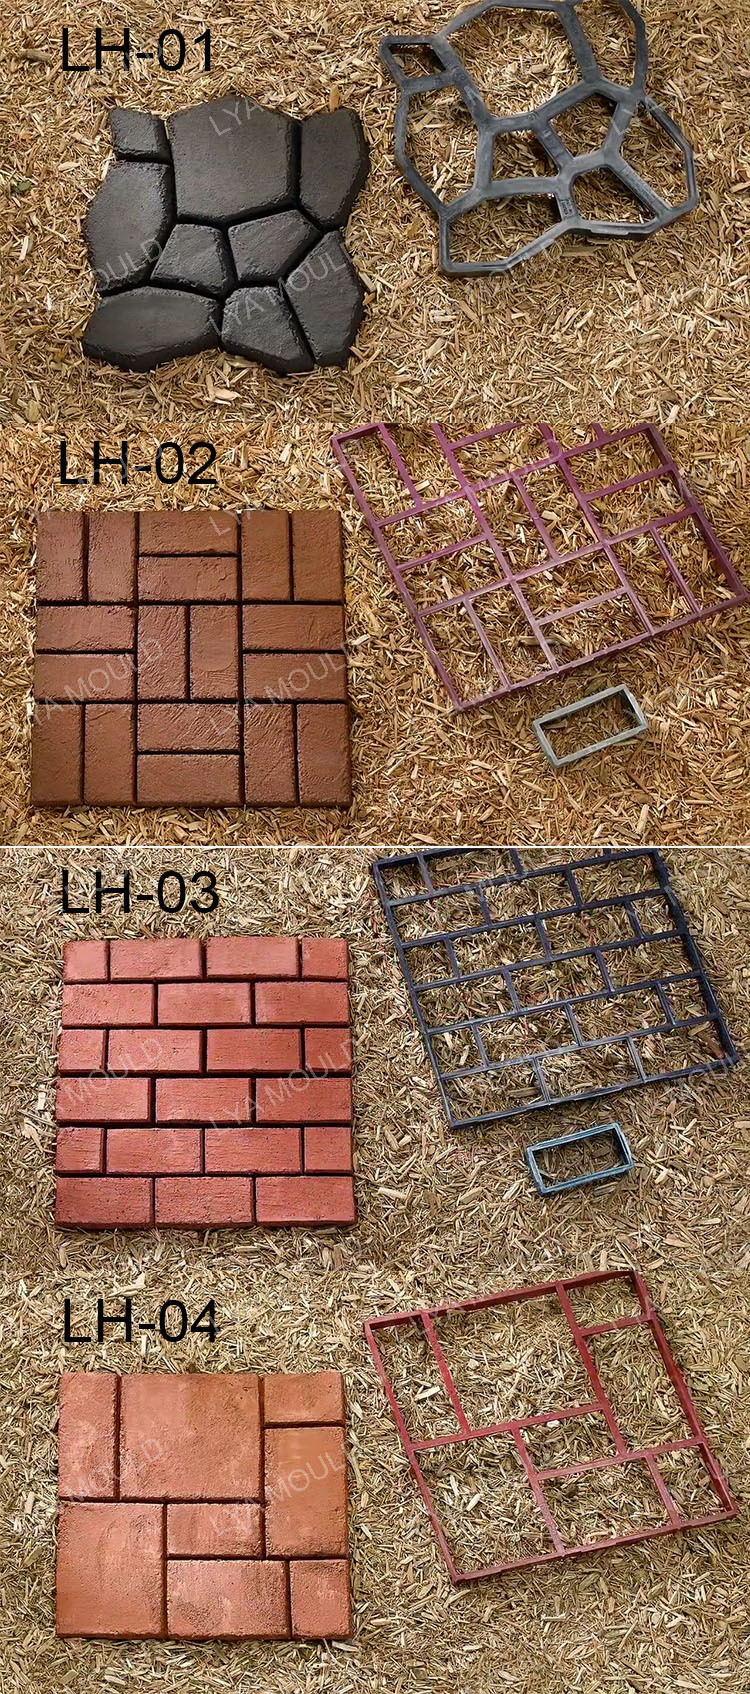 Concrete Cement Path Paver Patio Mould For Walkmaker Pathmate Garden Stone